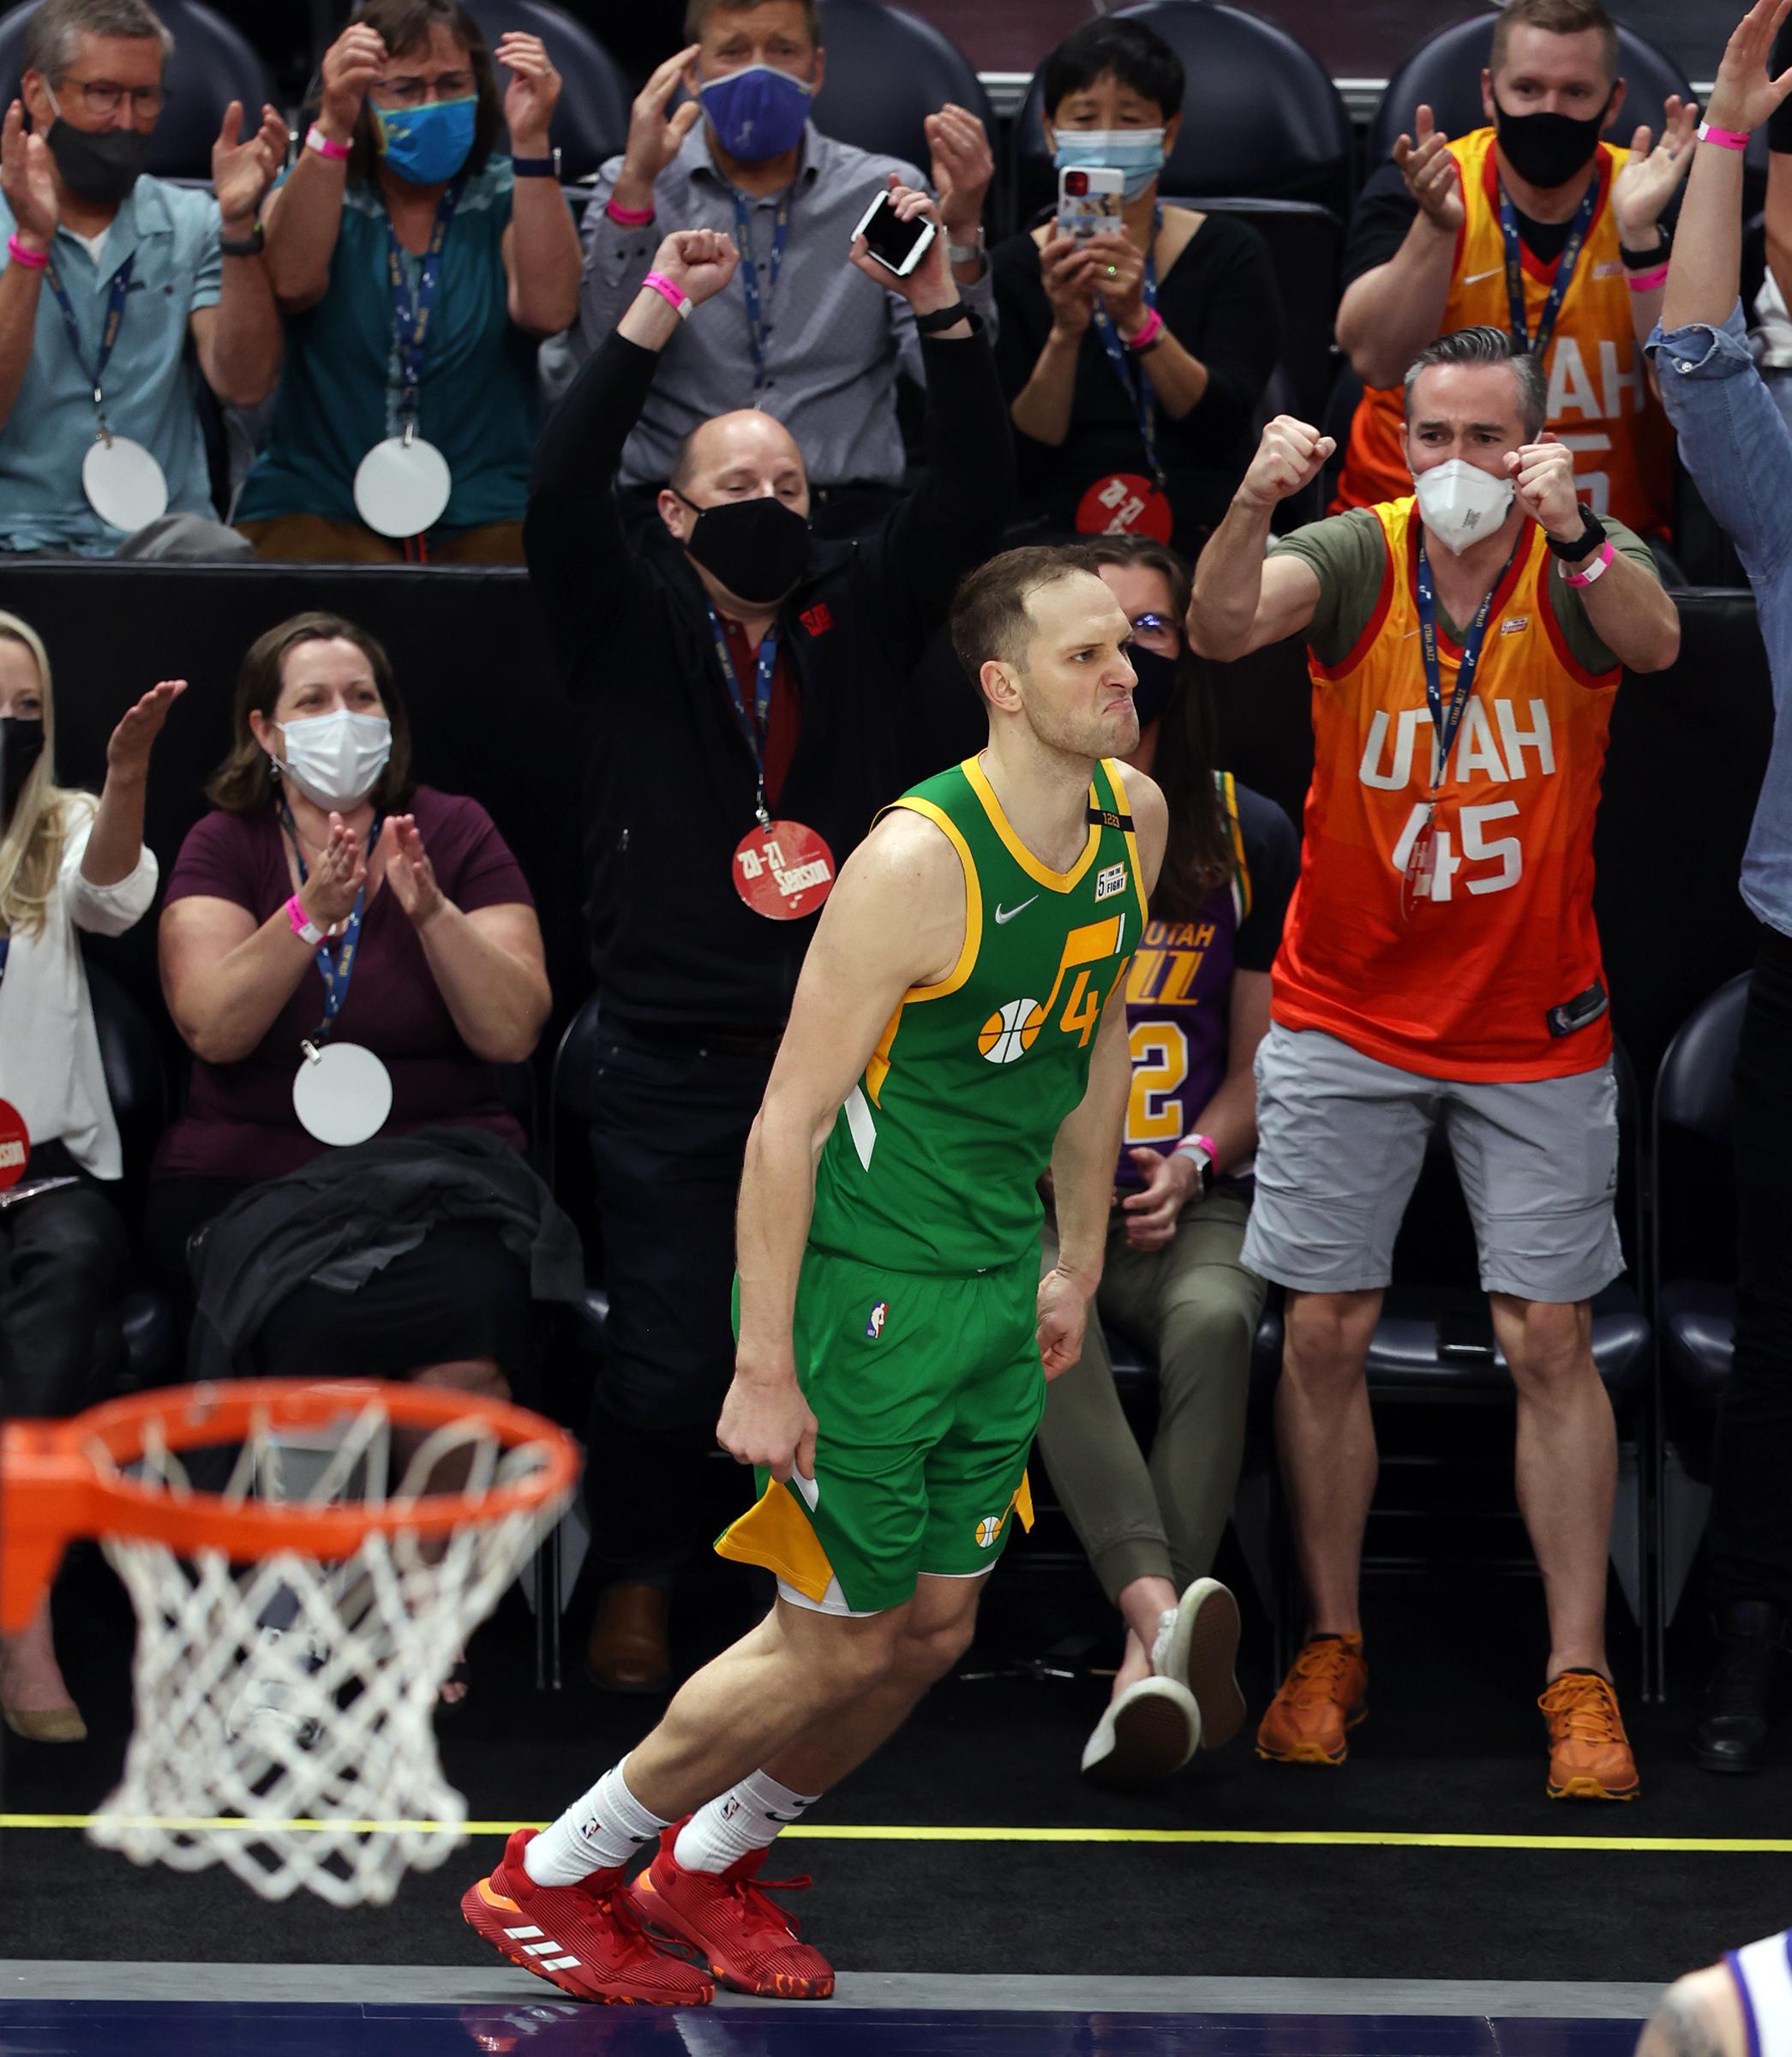 Utah Jazz forward Bojan Bogdanovic (44) makes a face as the crowd erupts after Bogdanovic sank a three point shot as the Utah Jazz and the Denver Nuggets play an NBA basketball game at Vivint Arena in Salt Lake City on Friday, May 7, 2021. Utah won 127-120.